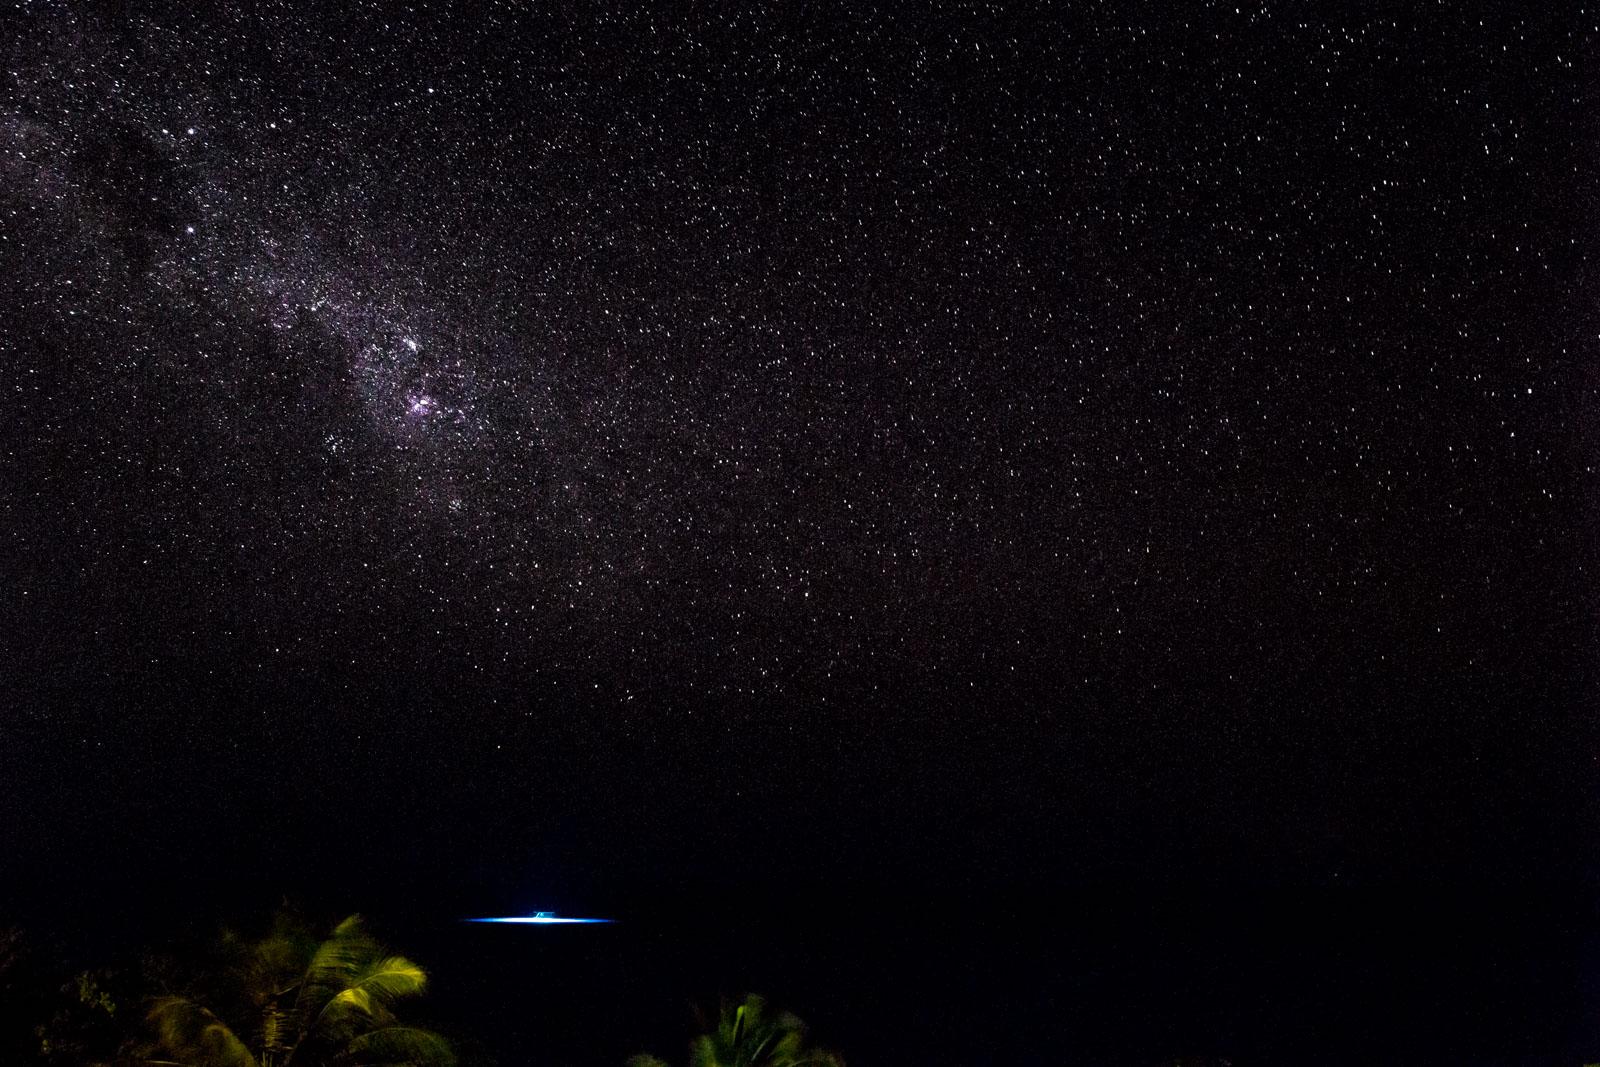 6-milkyway-night-sky-manta-resort-underwater-room-money-shots